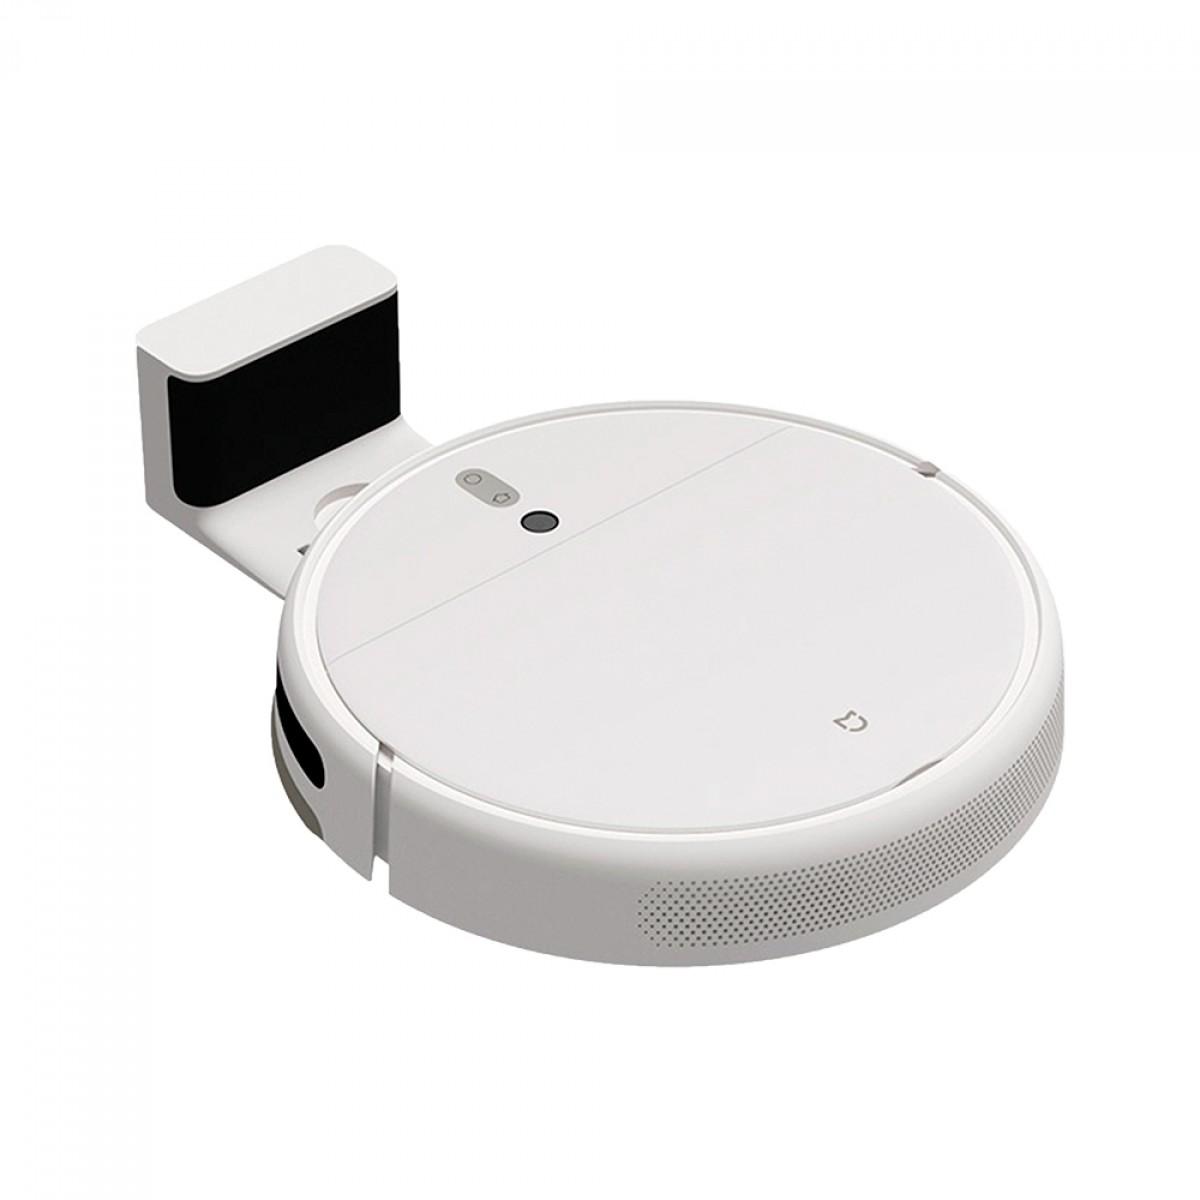 Robô Aspirador Inteligente Xiaomi Mi Robot Vacuum MOP1C, 40W, 2500PA, WI-FI, Branco, PRD-X00513